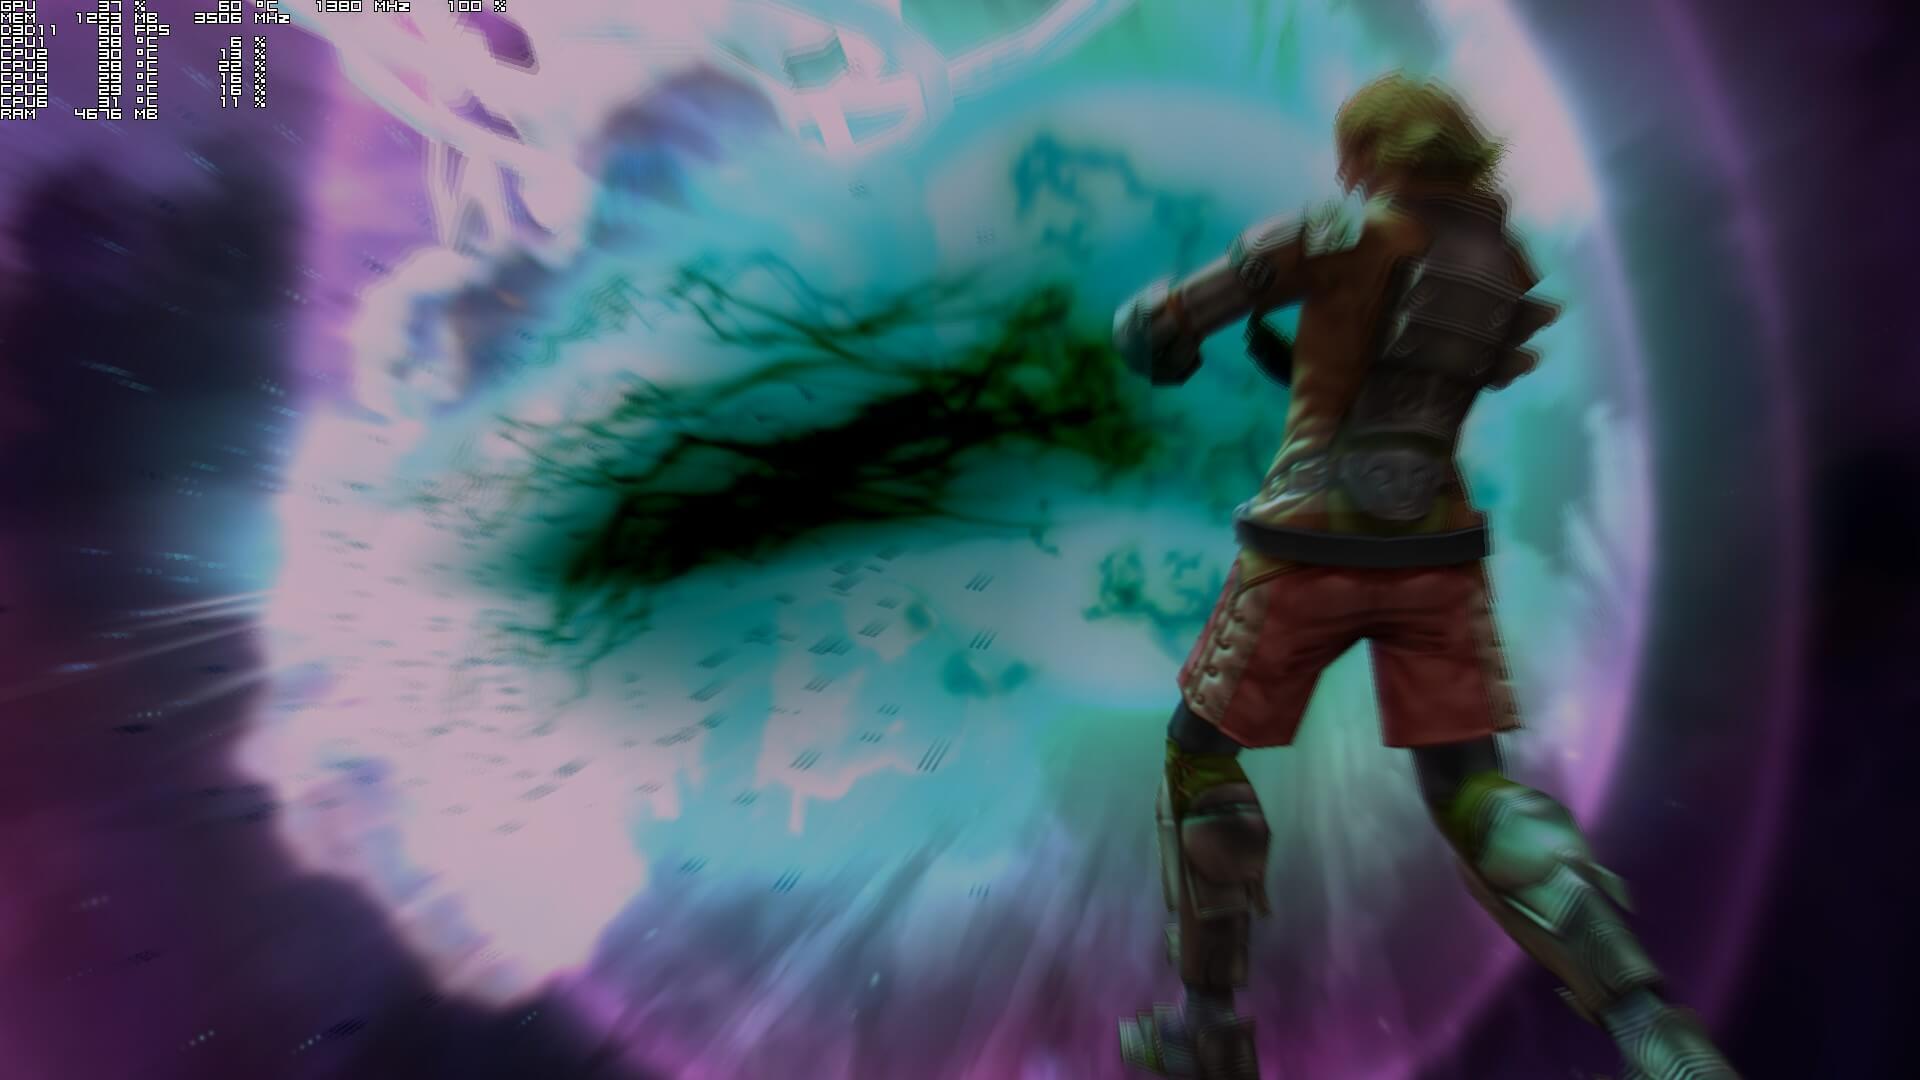 Final Fantasy XII The Zodiac Age PC Performance Analysis